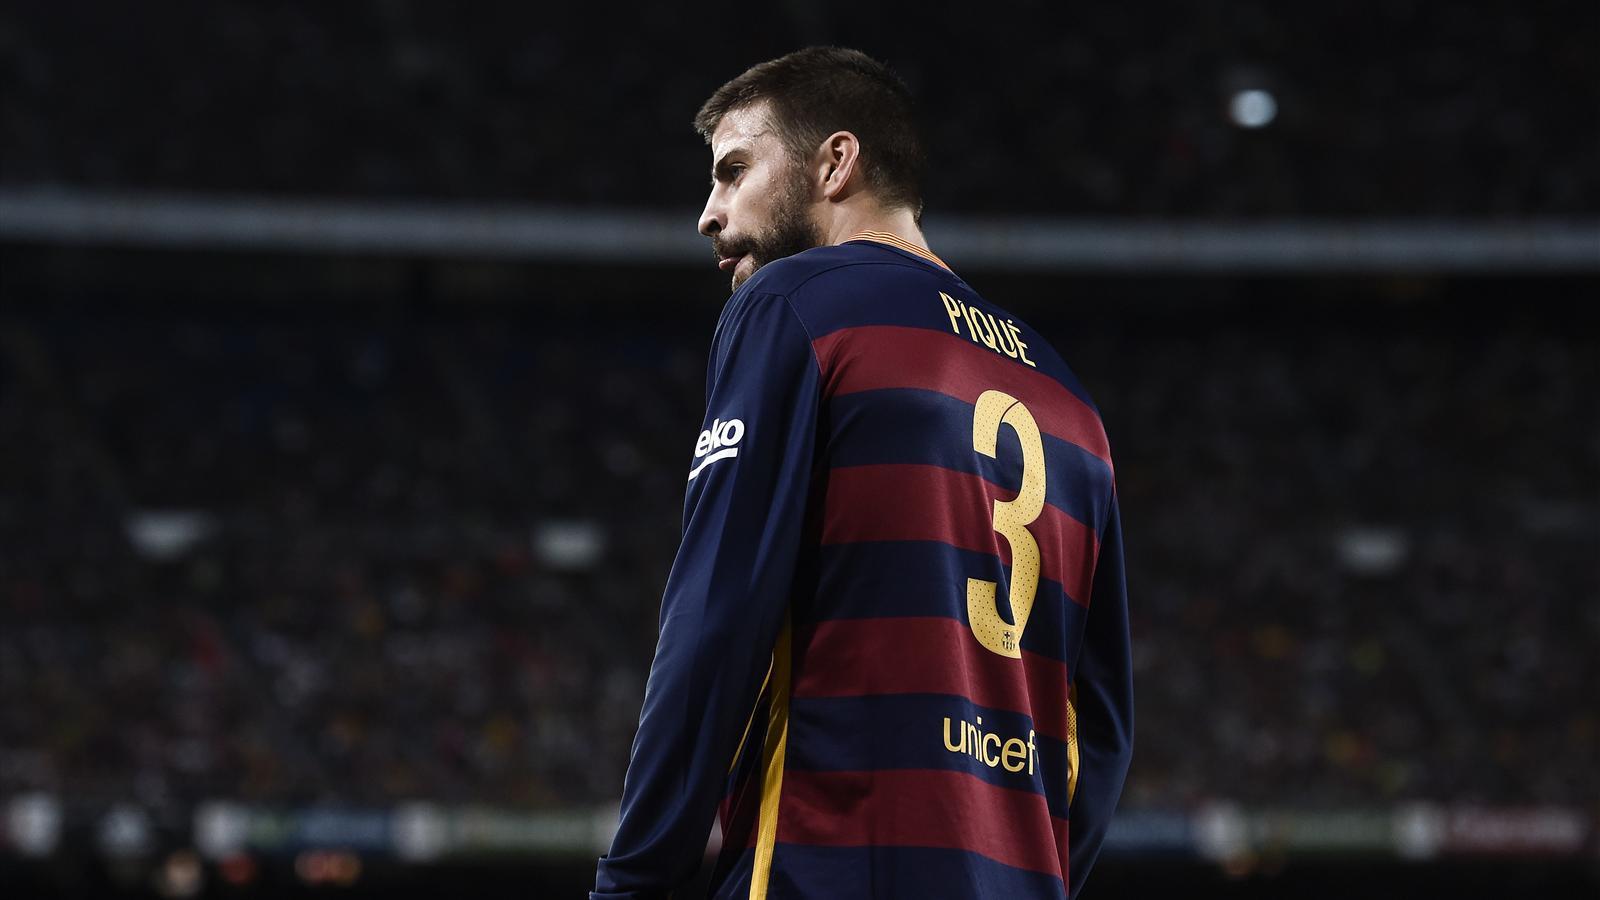 Barcelona's Gerard Pique was sent off against Athletic Bilbao